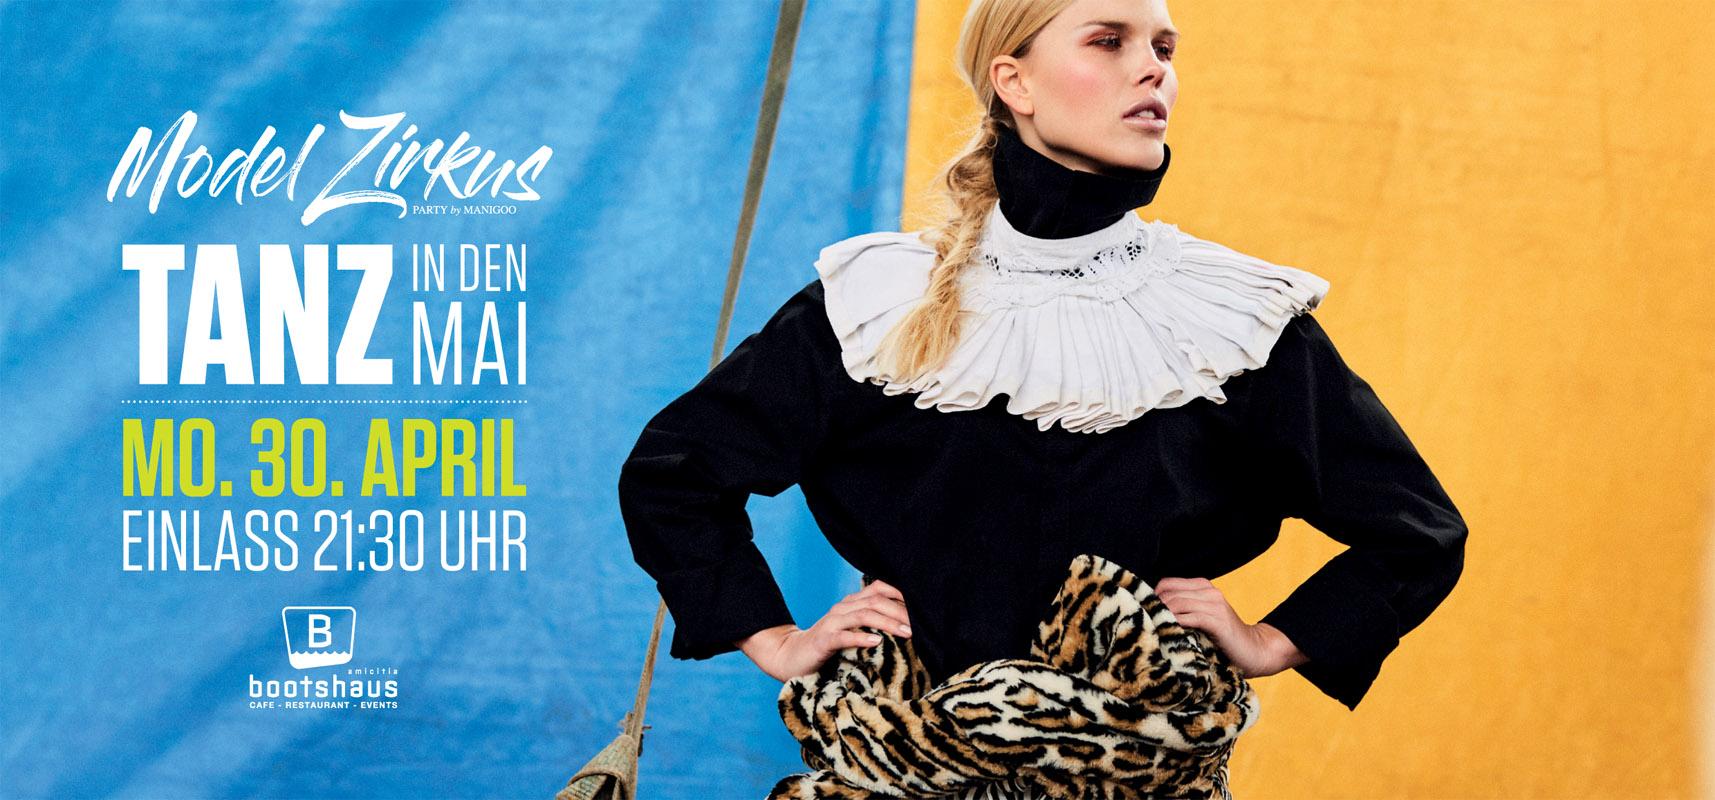 ModelZirk_Flyer_LangDIN_RZ1_kl